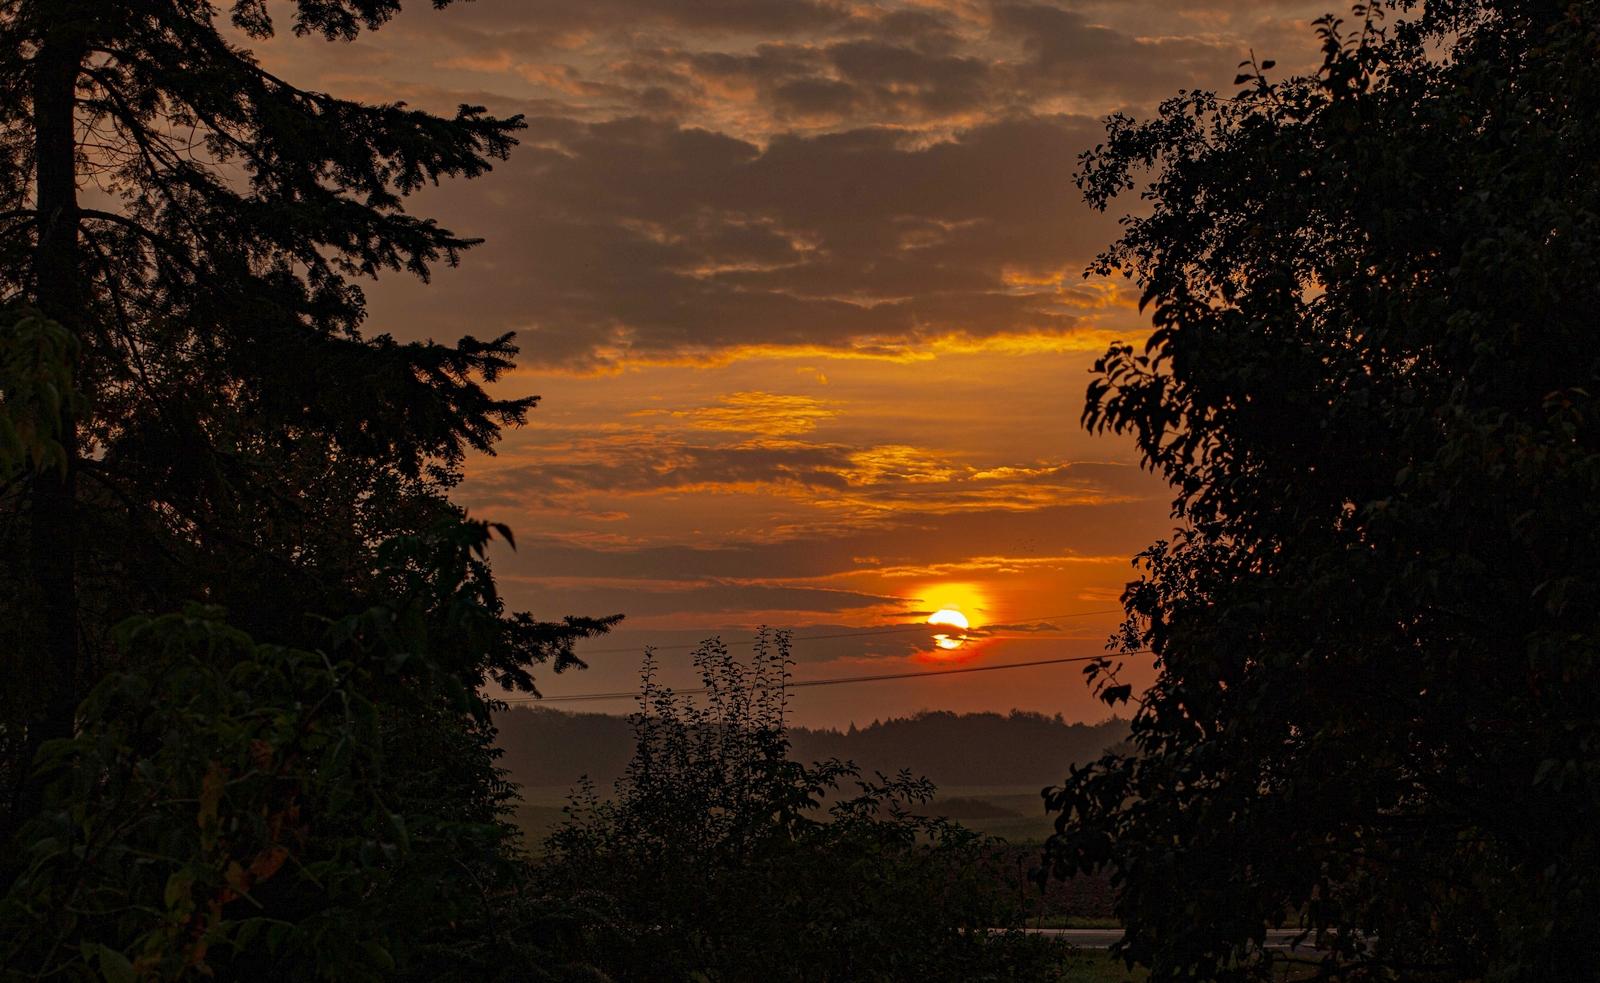 Sonnenaufgang 13.10.19 Mecklenburg